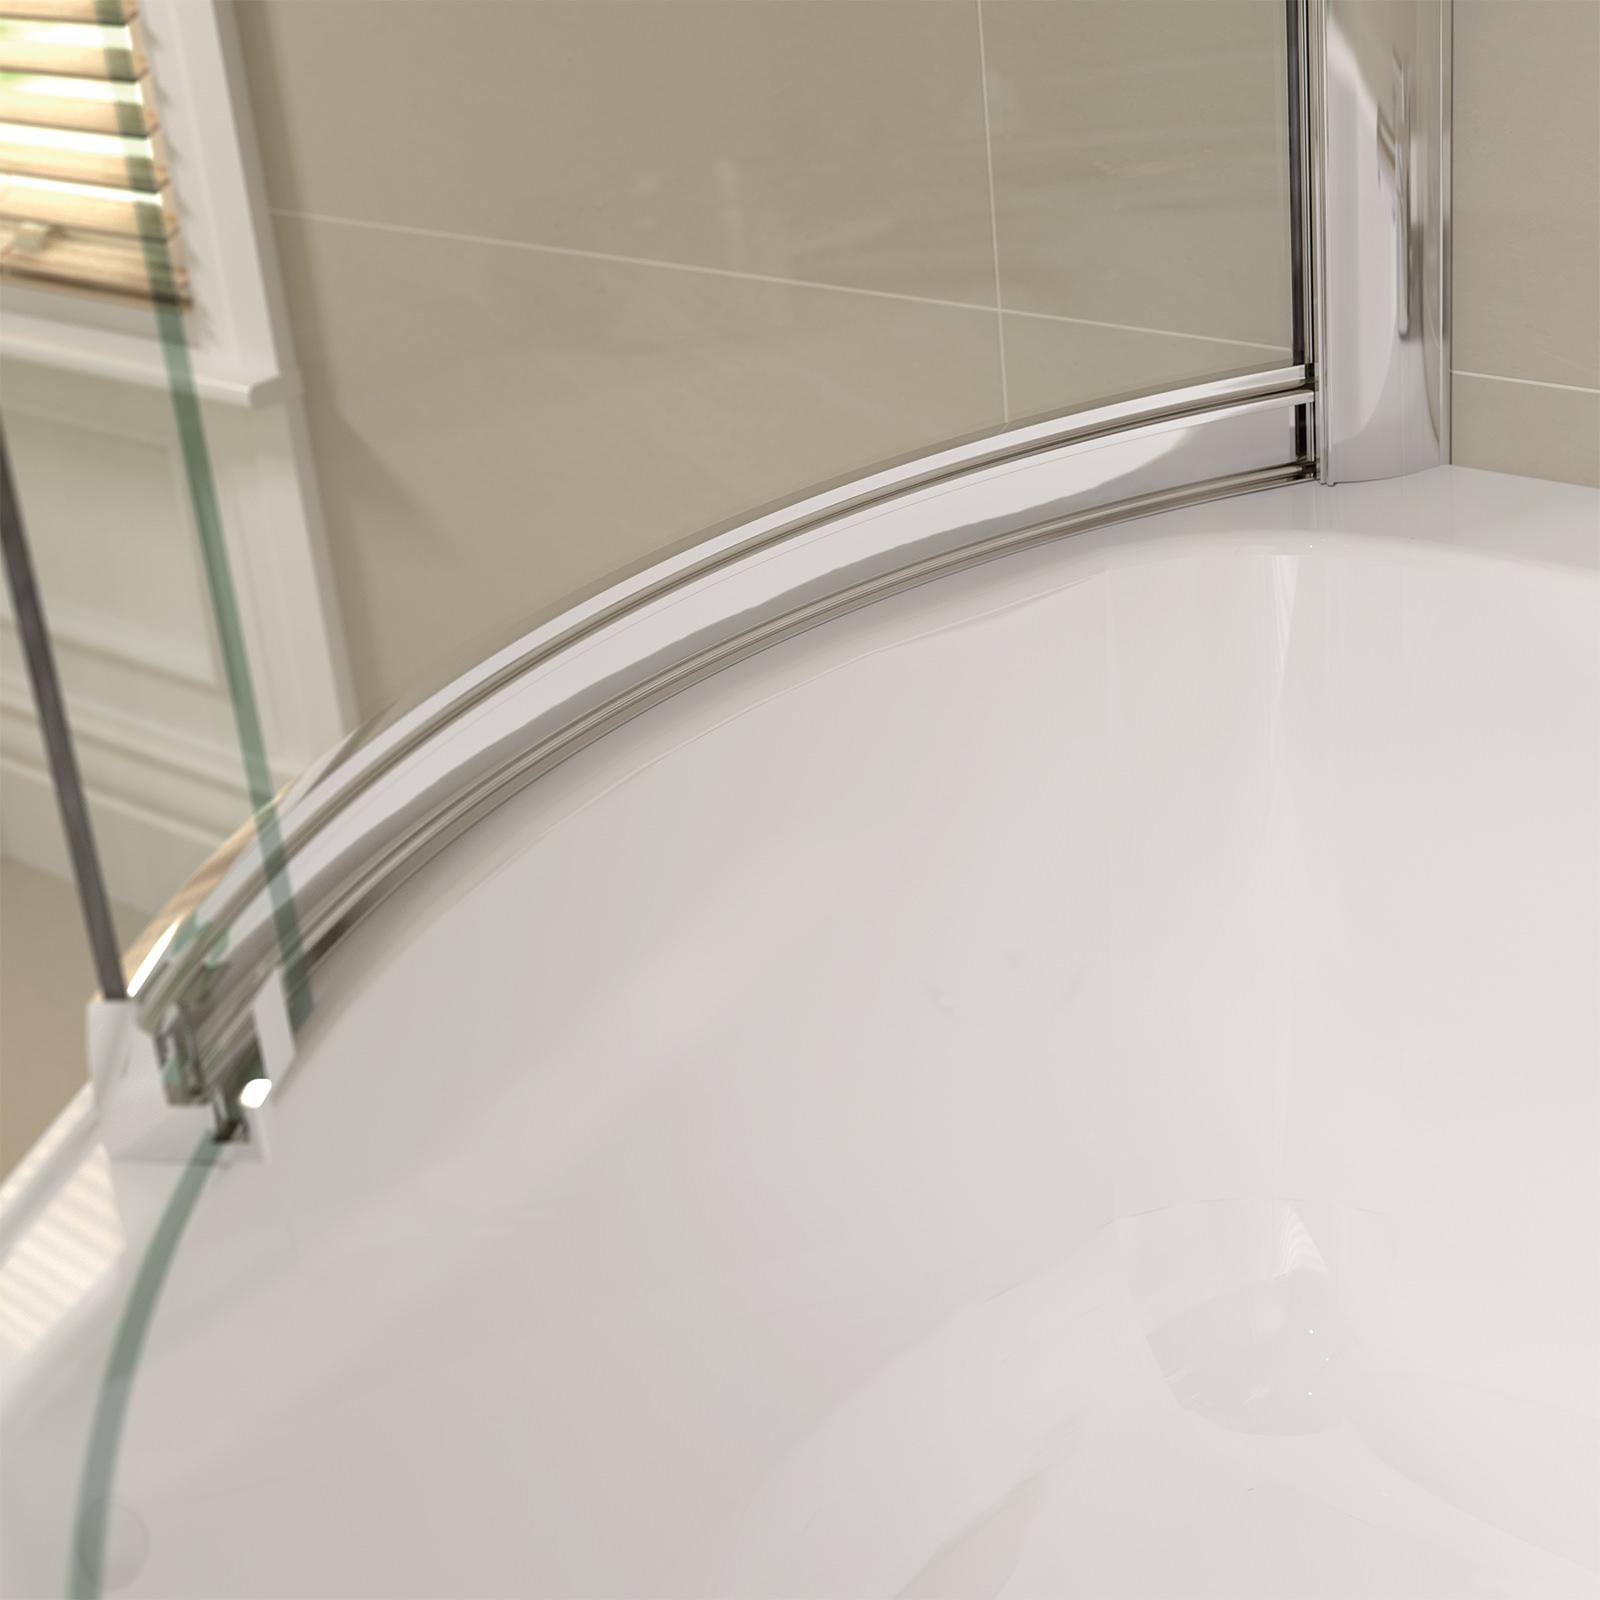 April Prestige 984 X 1500mm P Shaped Sliding Bath Screen